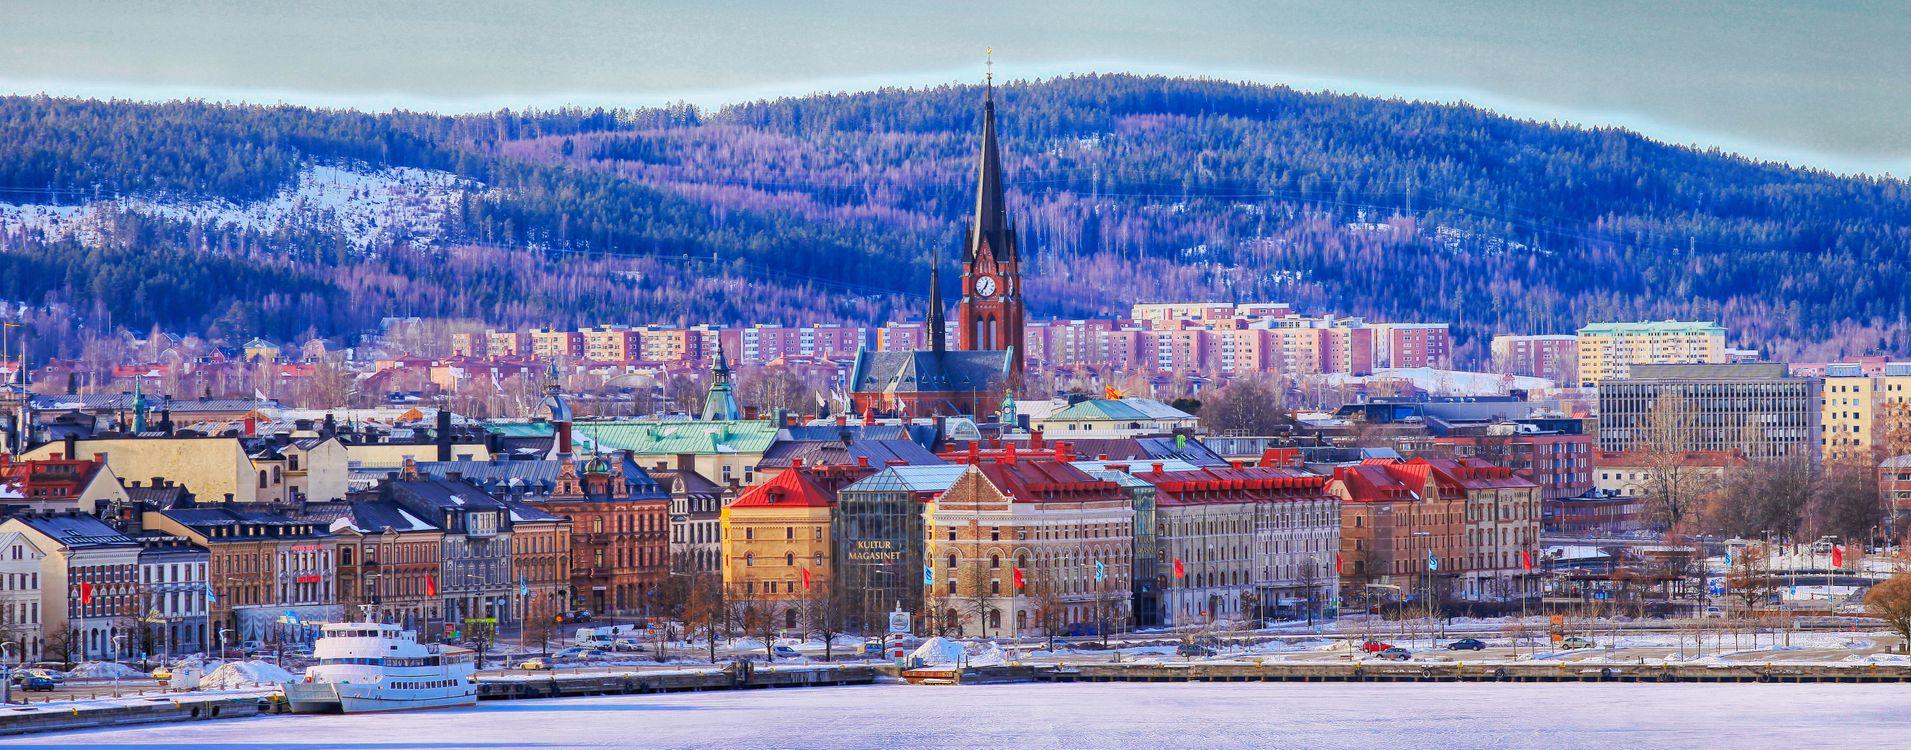 Фото бесплатно Сундсвалль, Sundsvall, город, Швеция, панорама - на рабочий стол